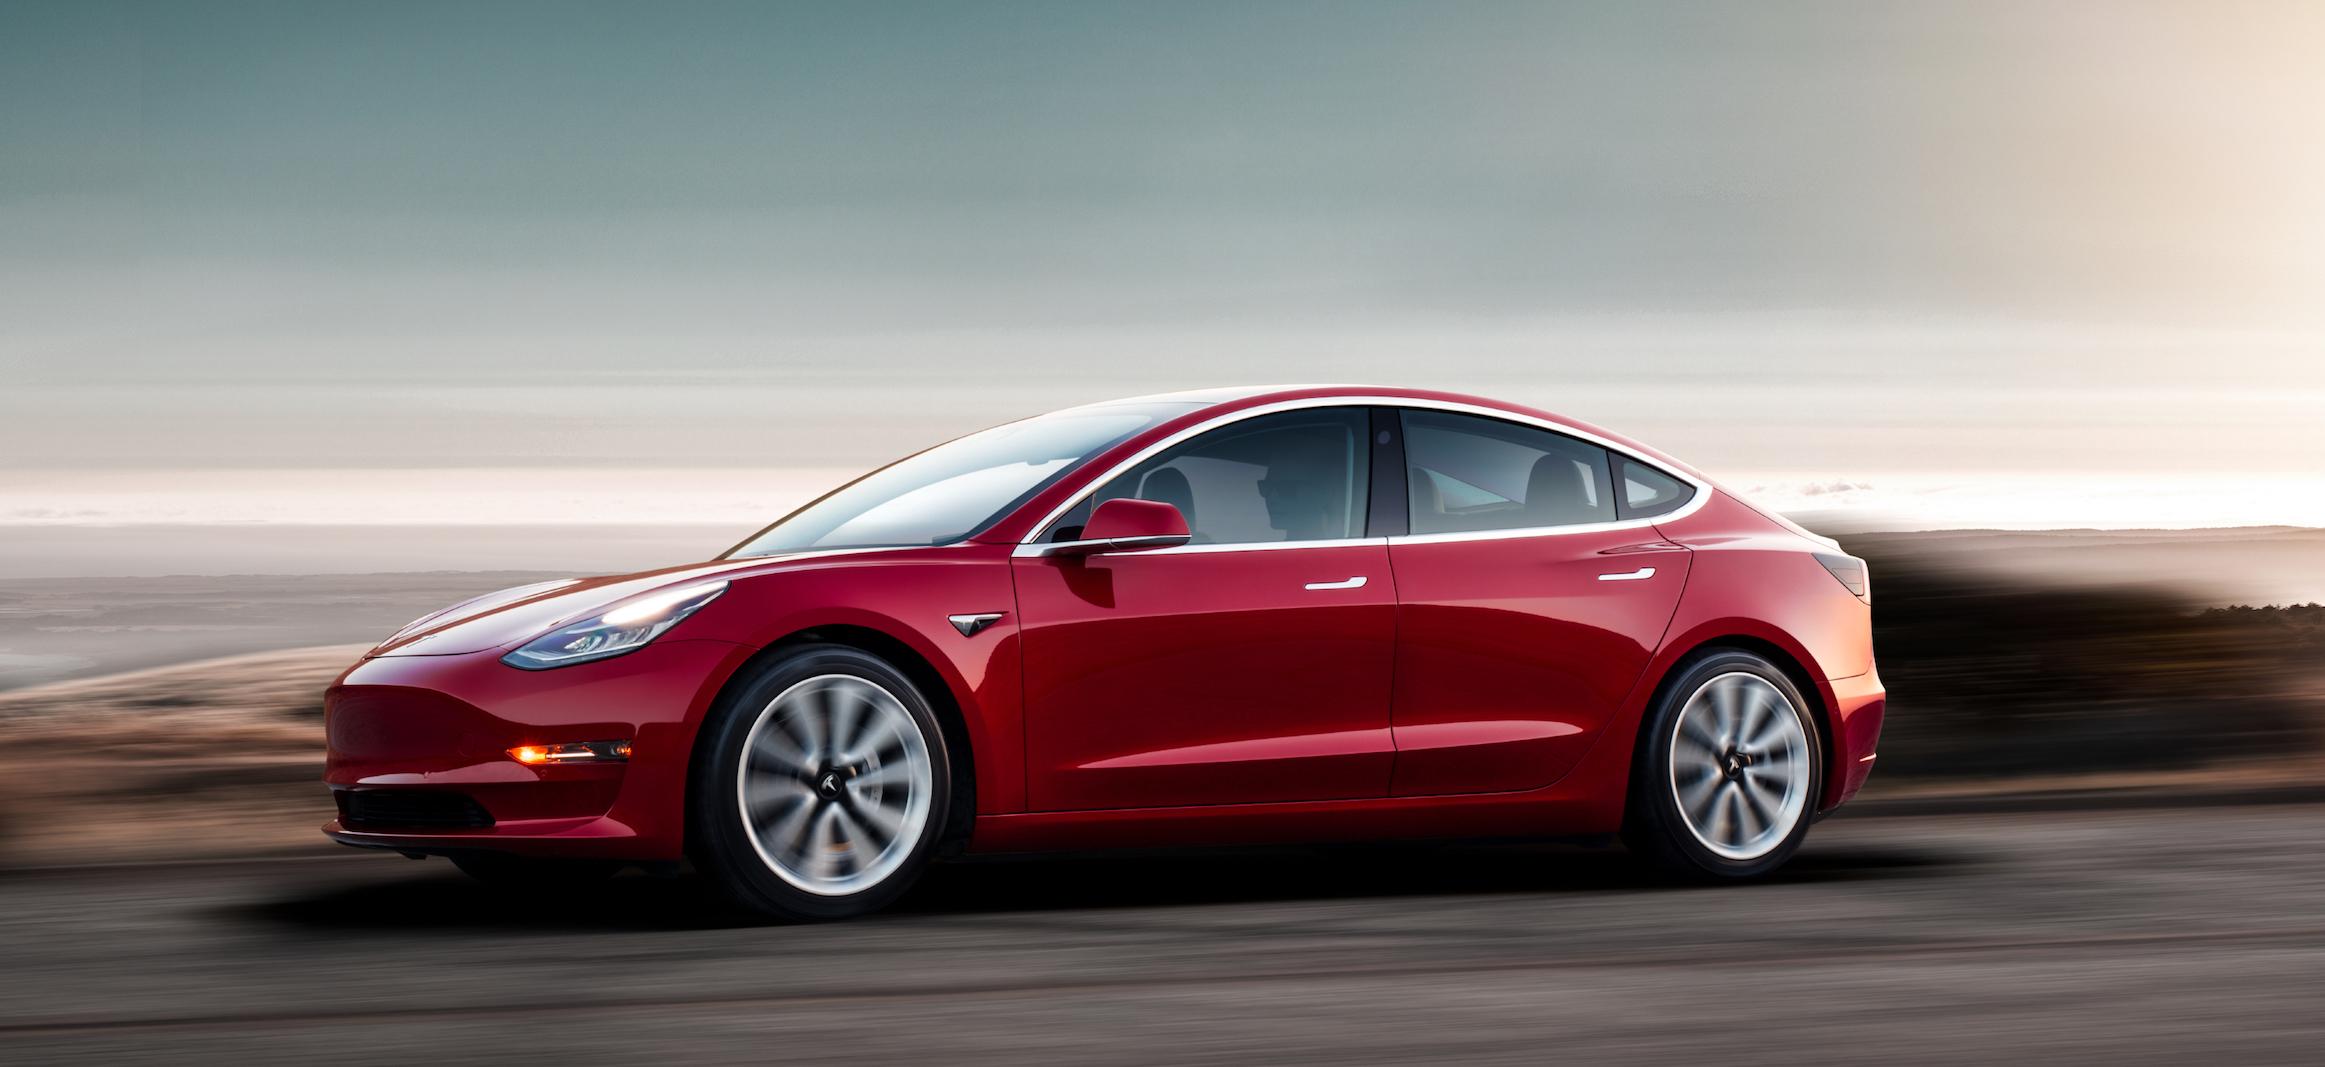 A red Tesla Model 3, an upscale compact sports sedan.